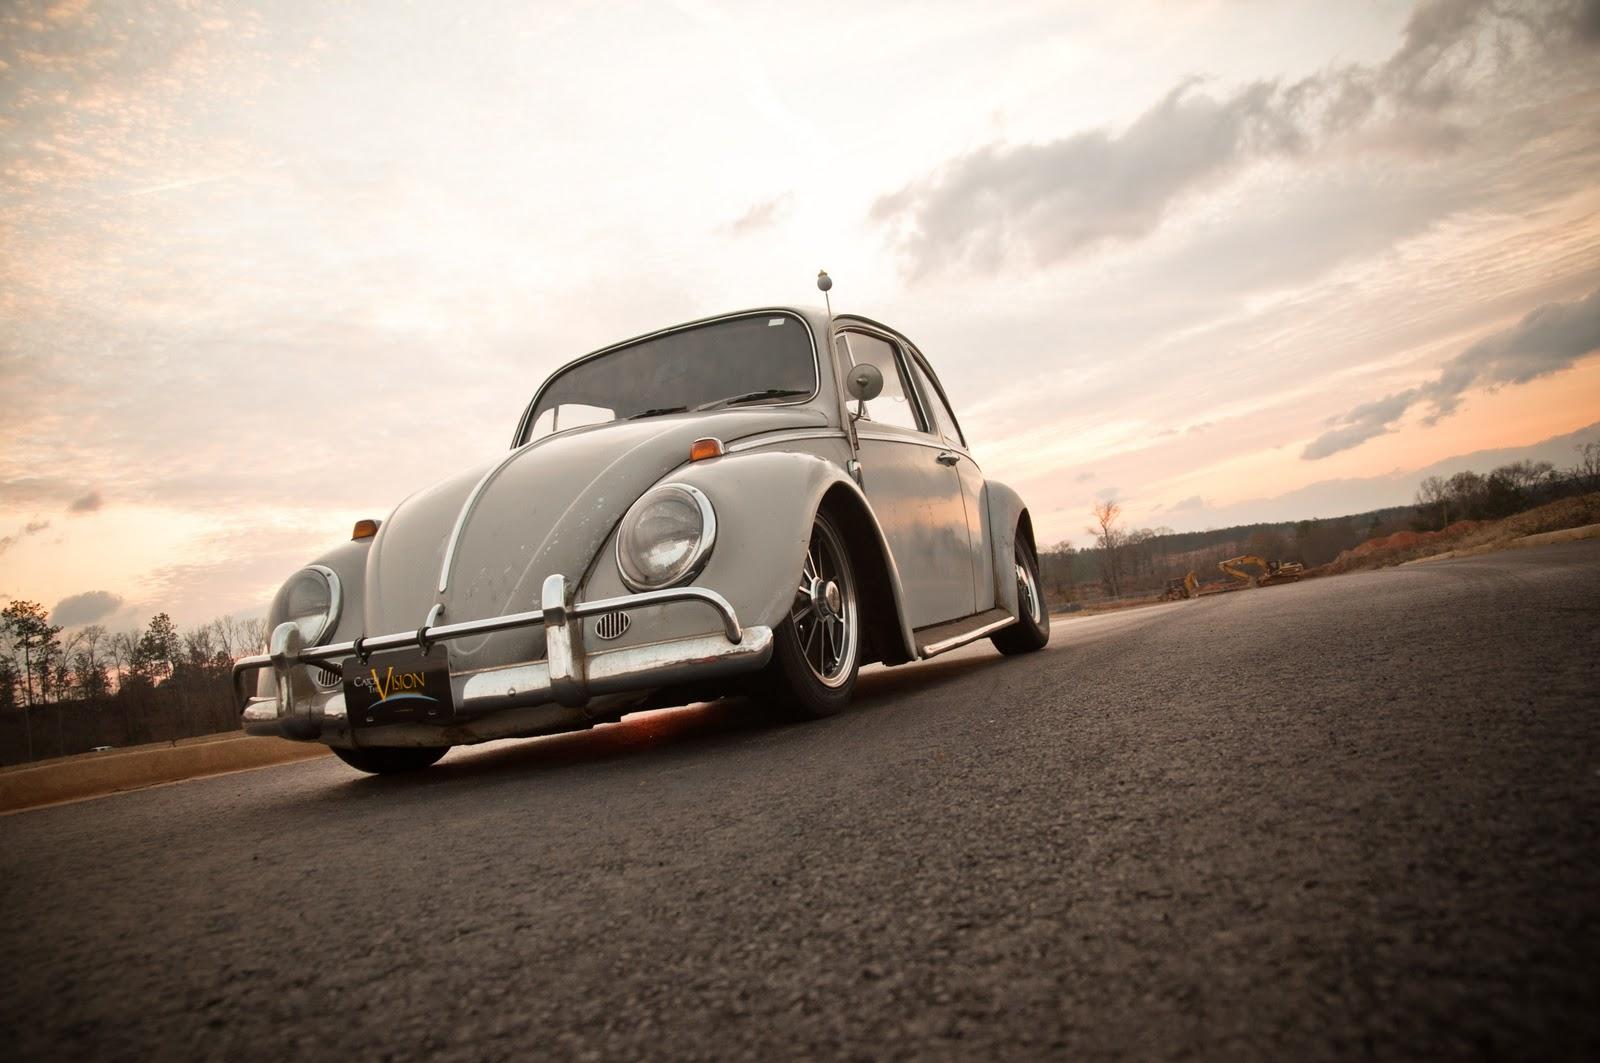 Otis - my '65 Beetle DSC_0037